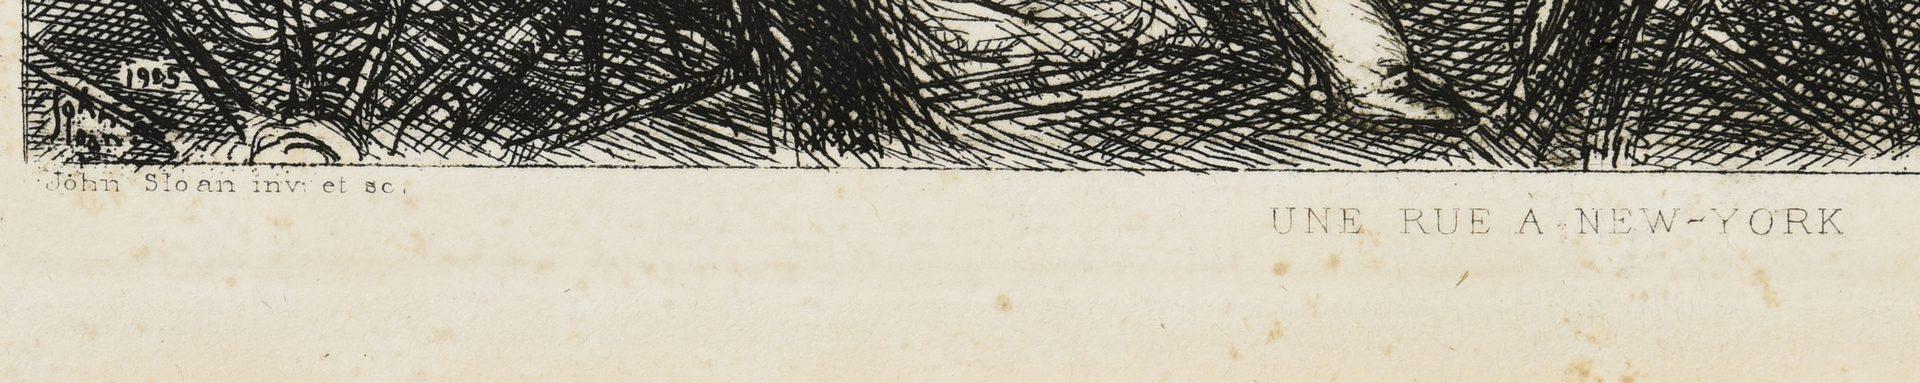 Lot 667: 3 Assorted Prints incl. Sloan